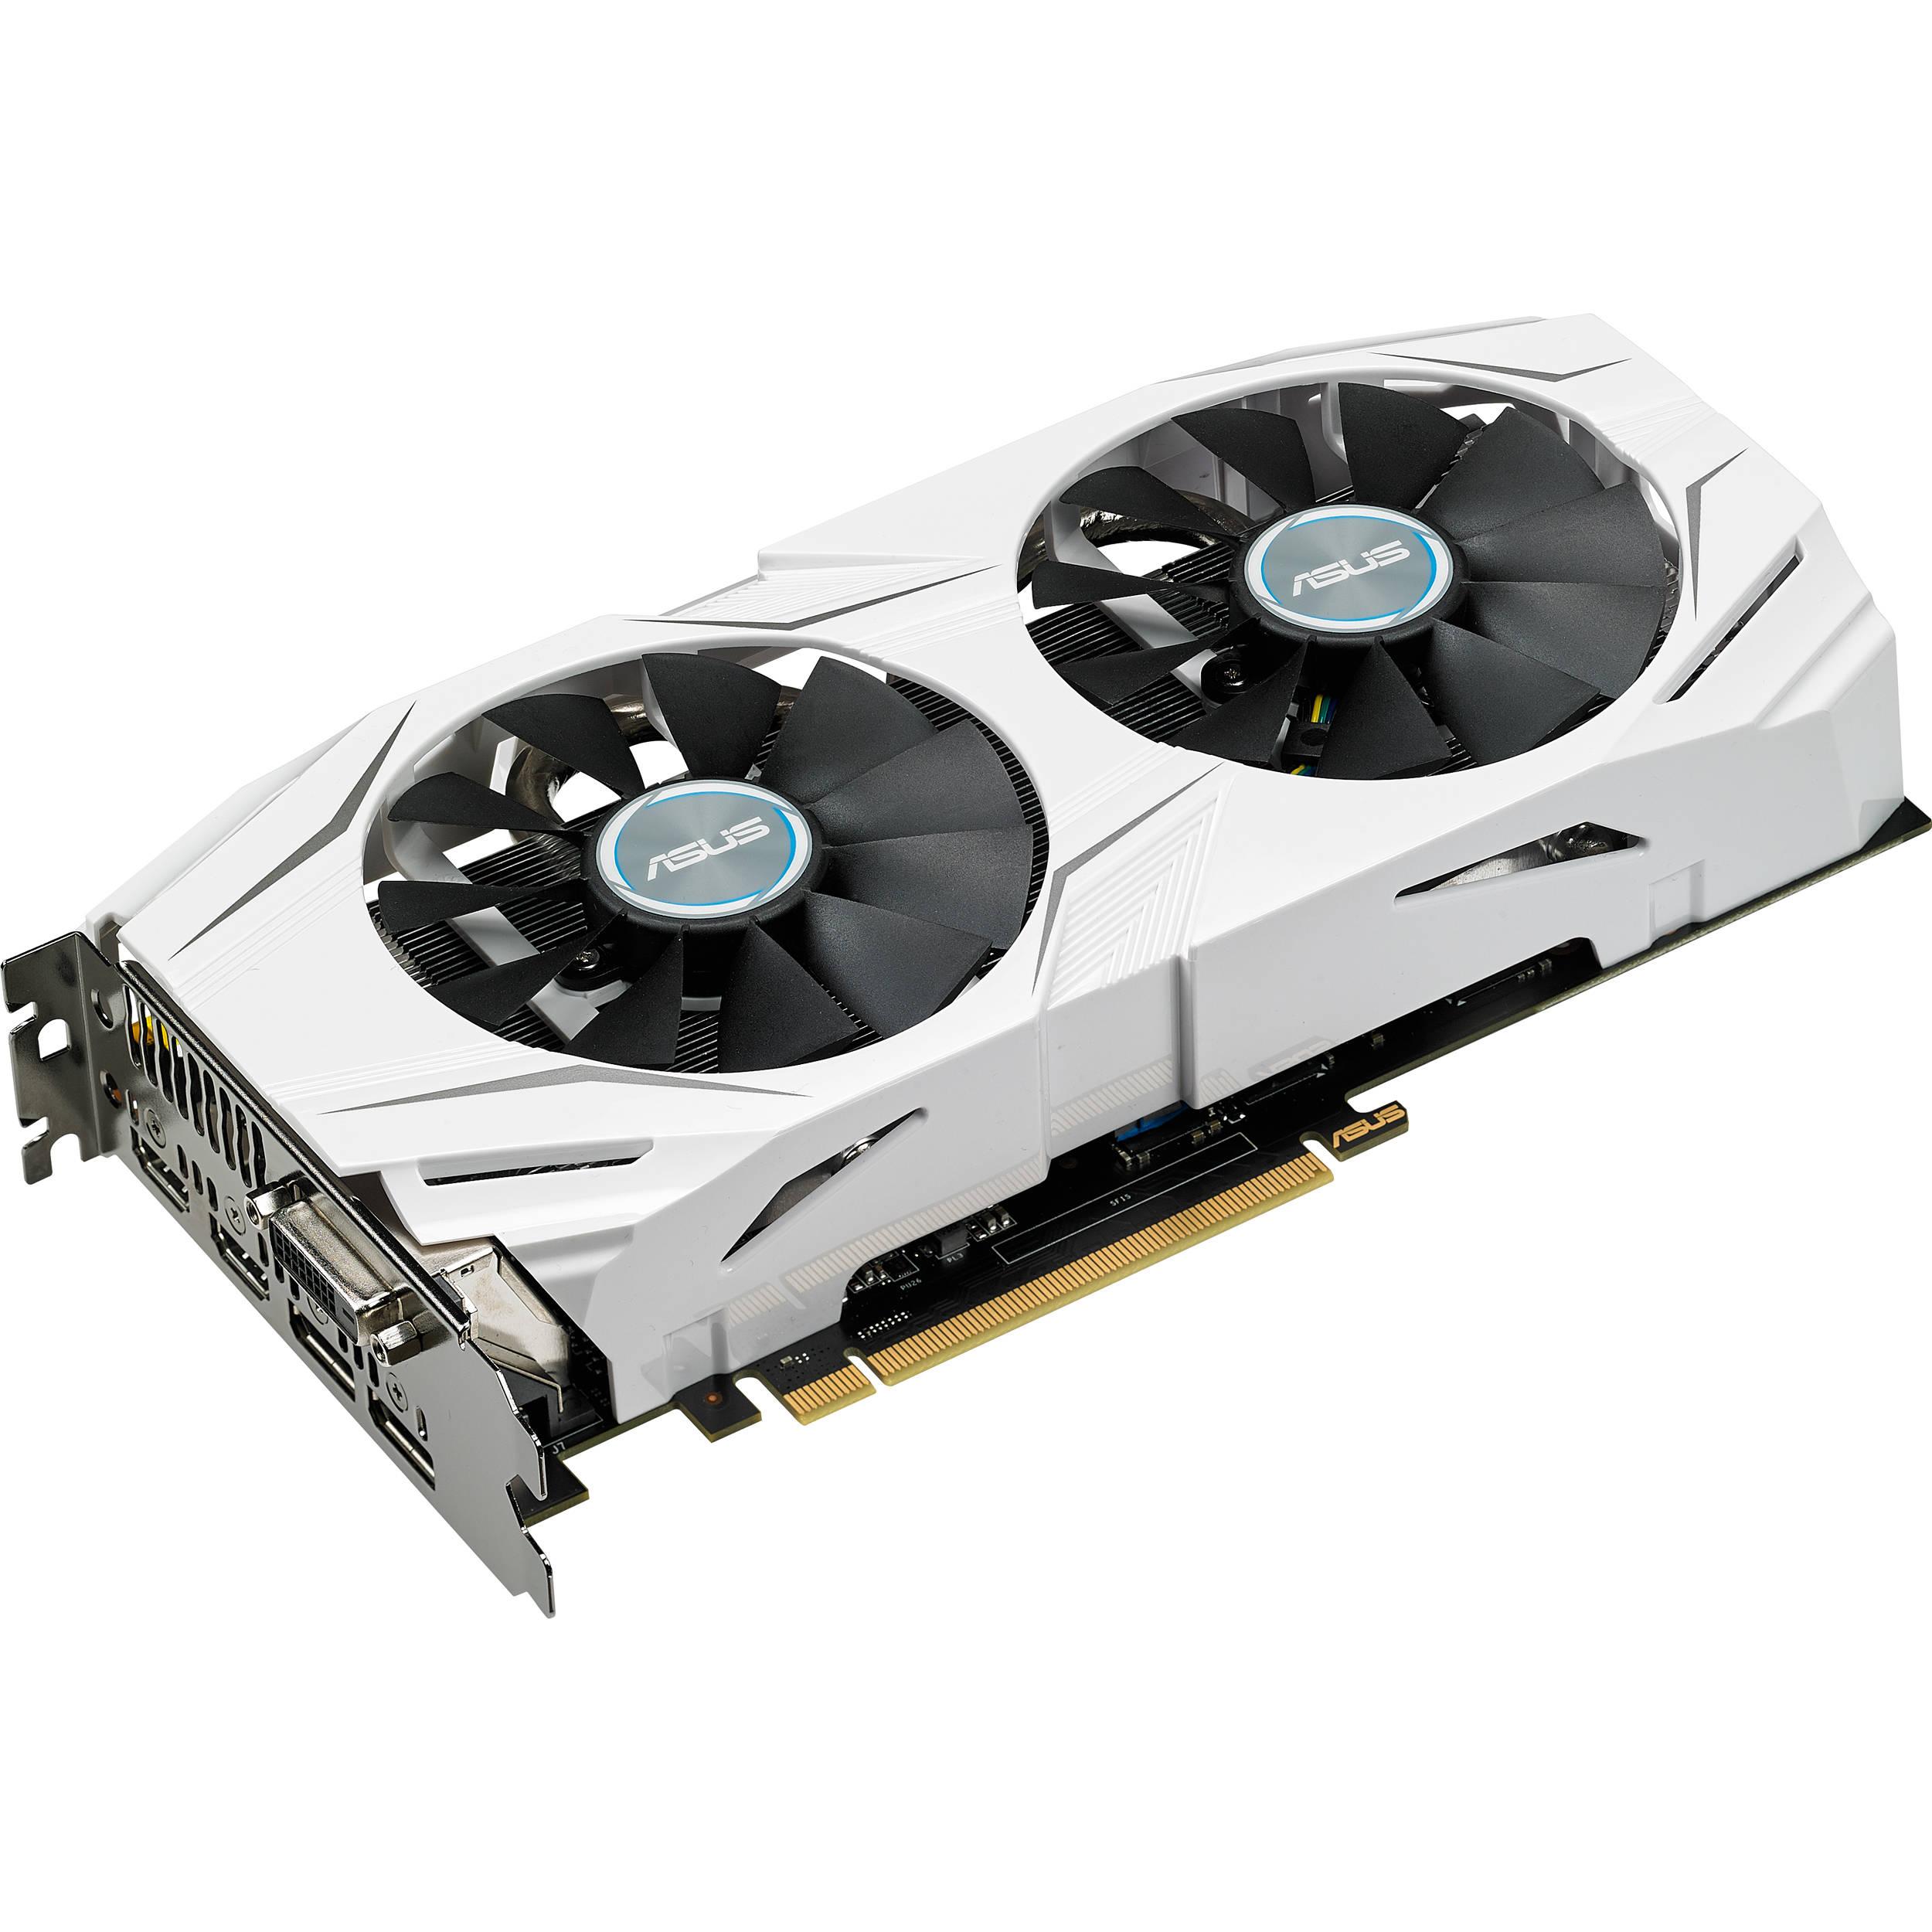 ASUS Dual OC GeForce GTX 1060 Graphics Card